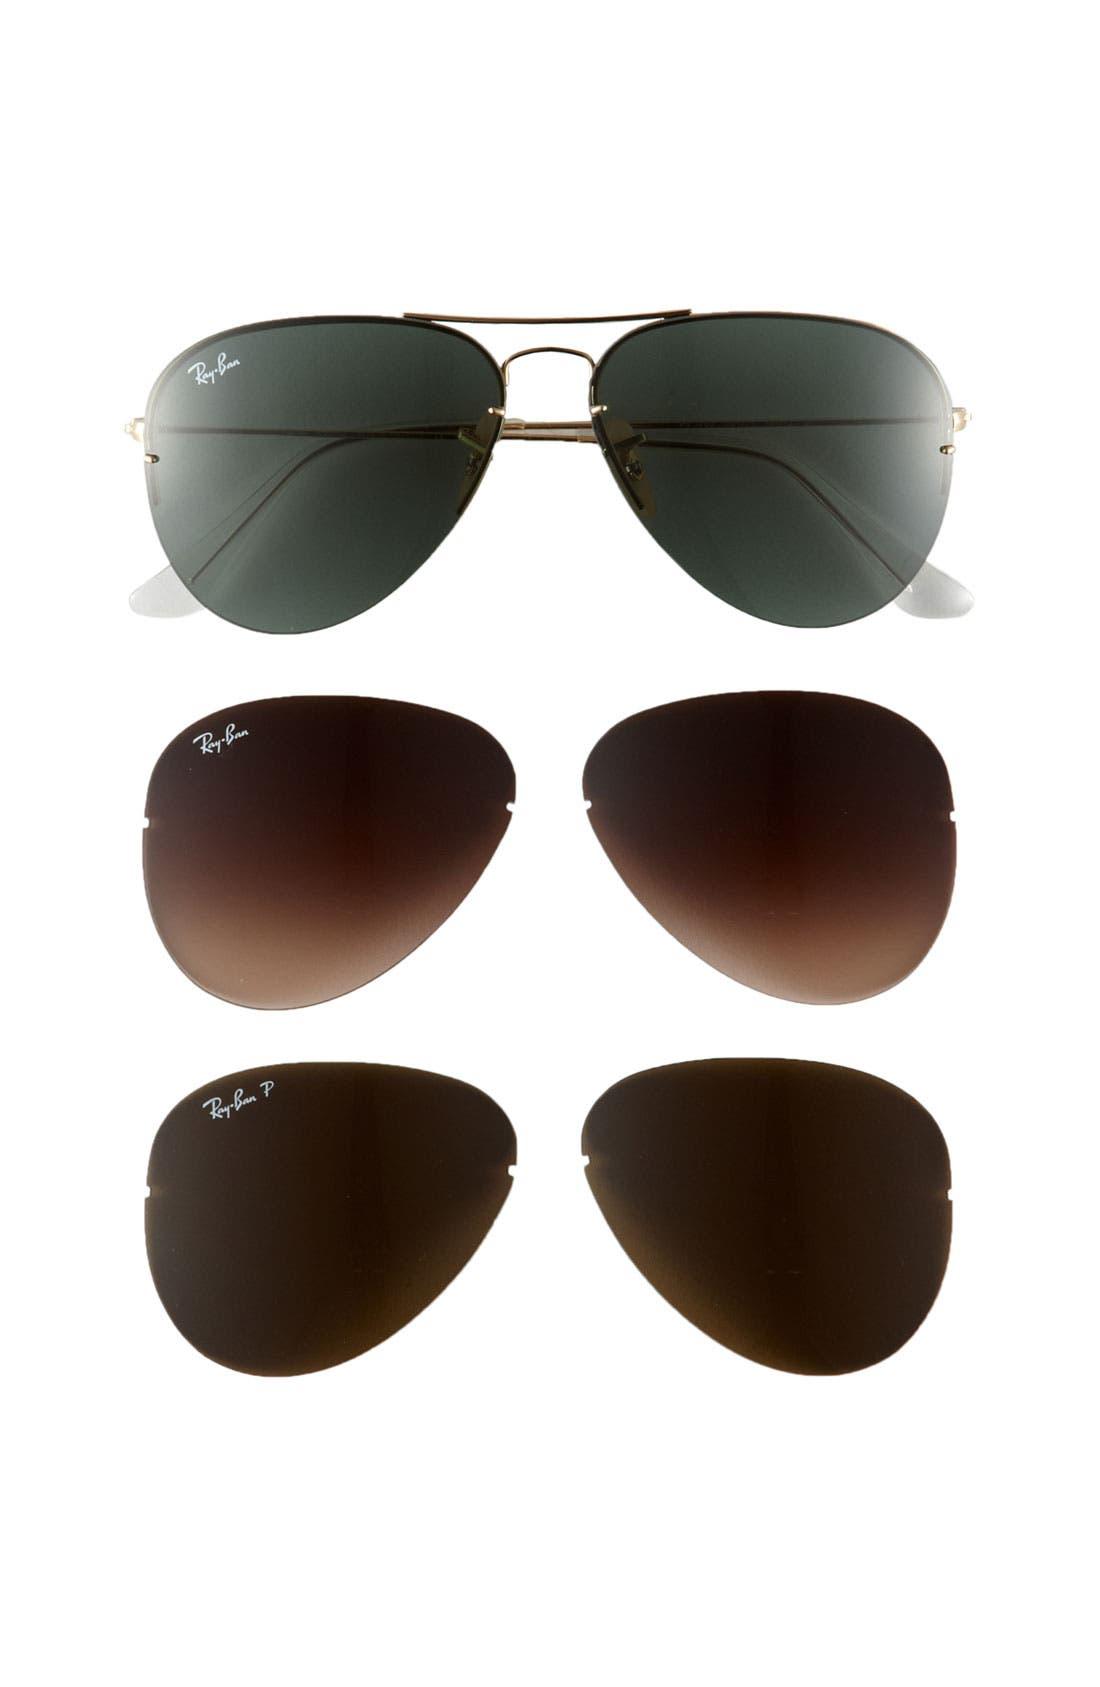 Main Image - Ray-Ban 'Light Ray - Interchangeable Lens Box Set' Aviator Sunglasses